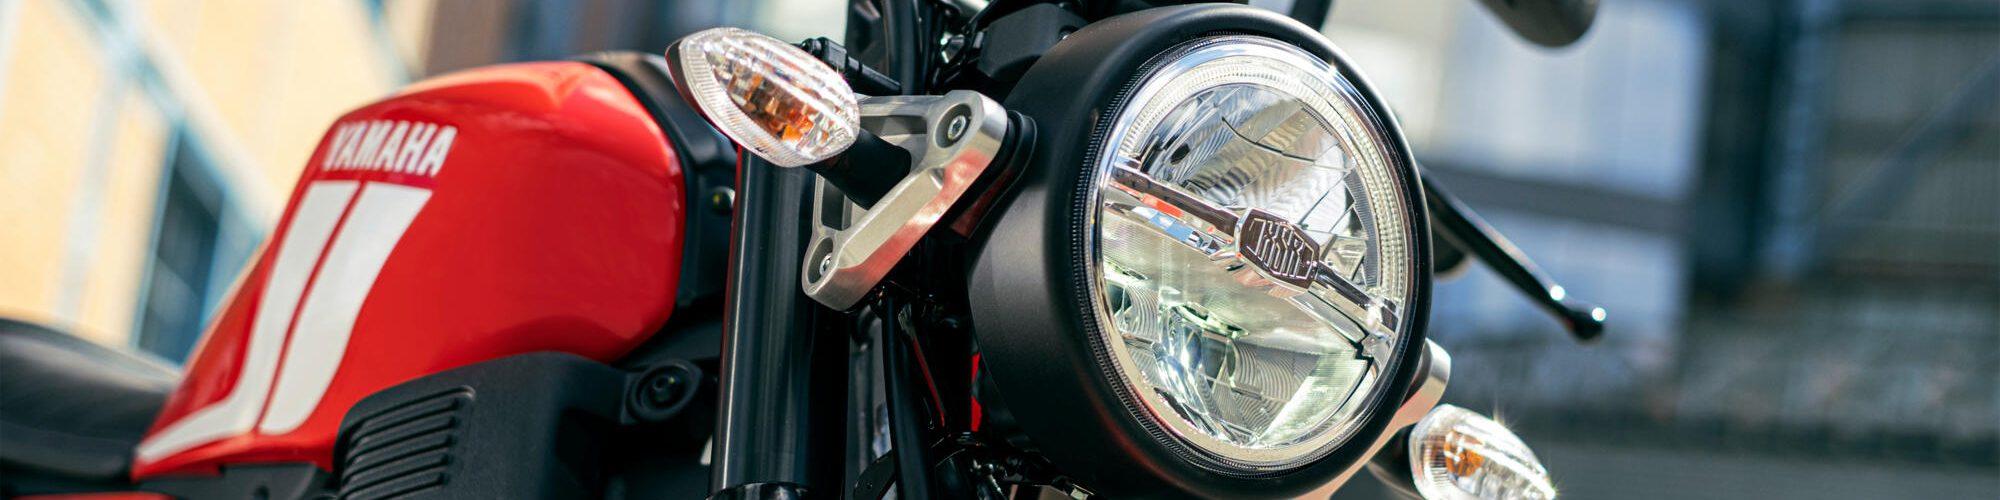 Yamaha XSR125   MotorCentrumWest